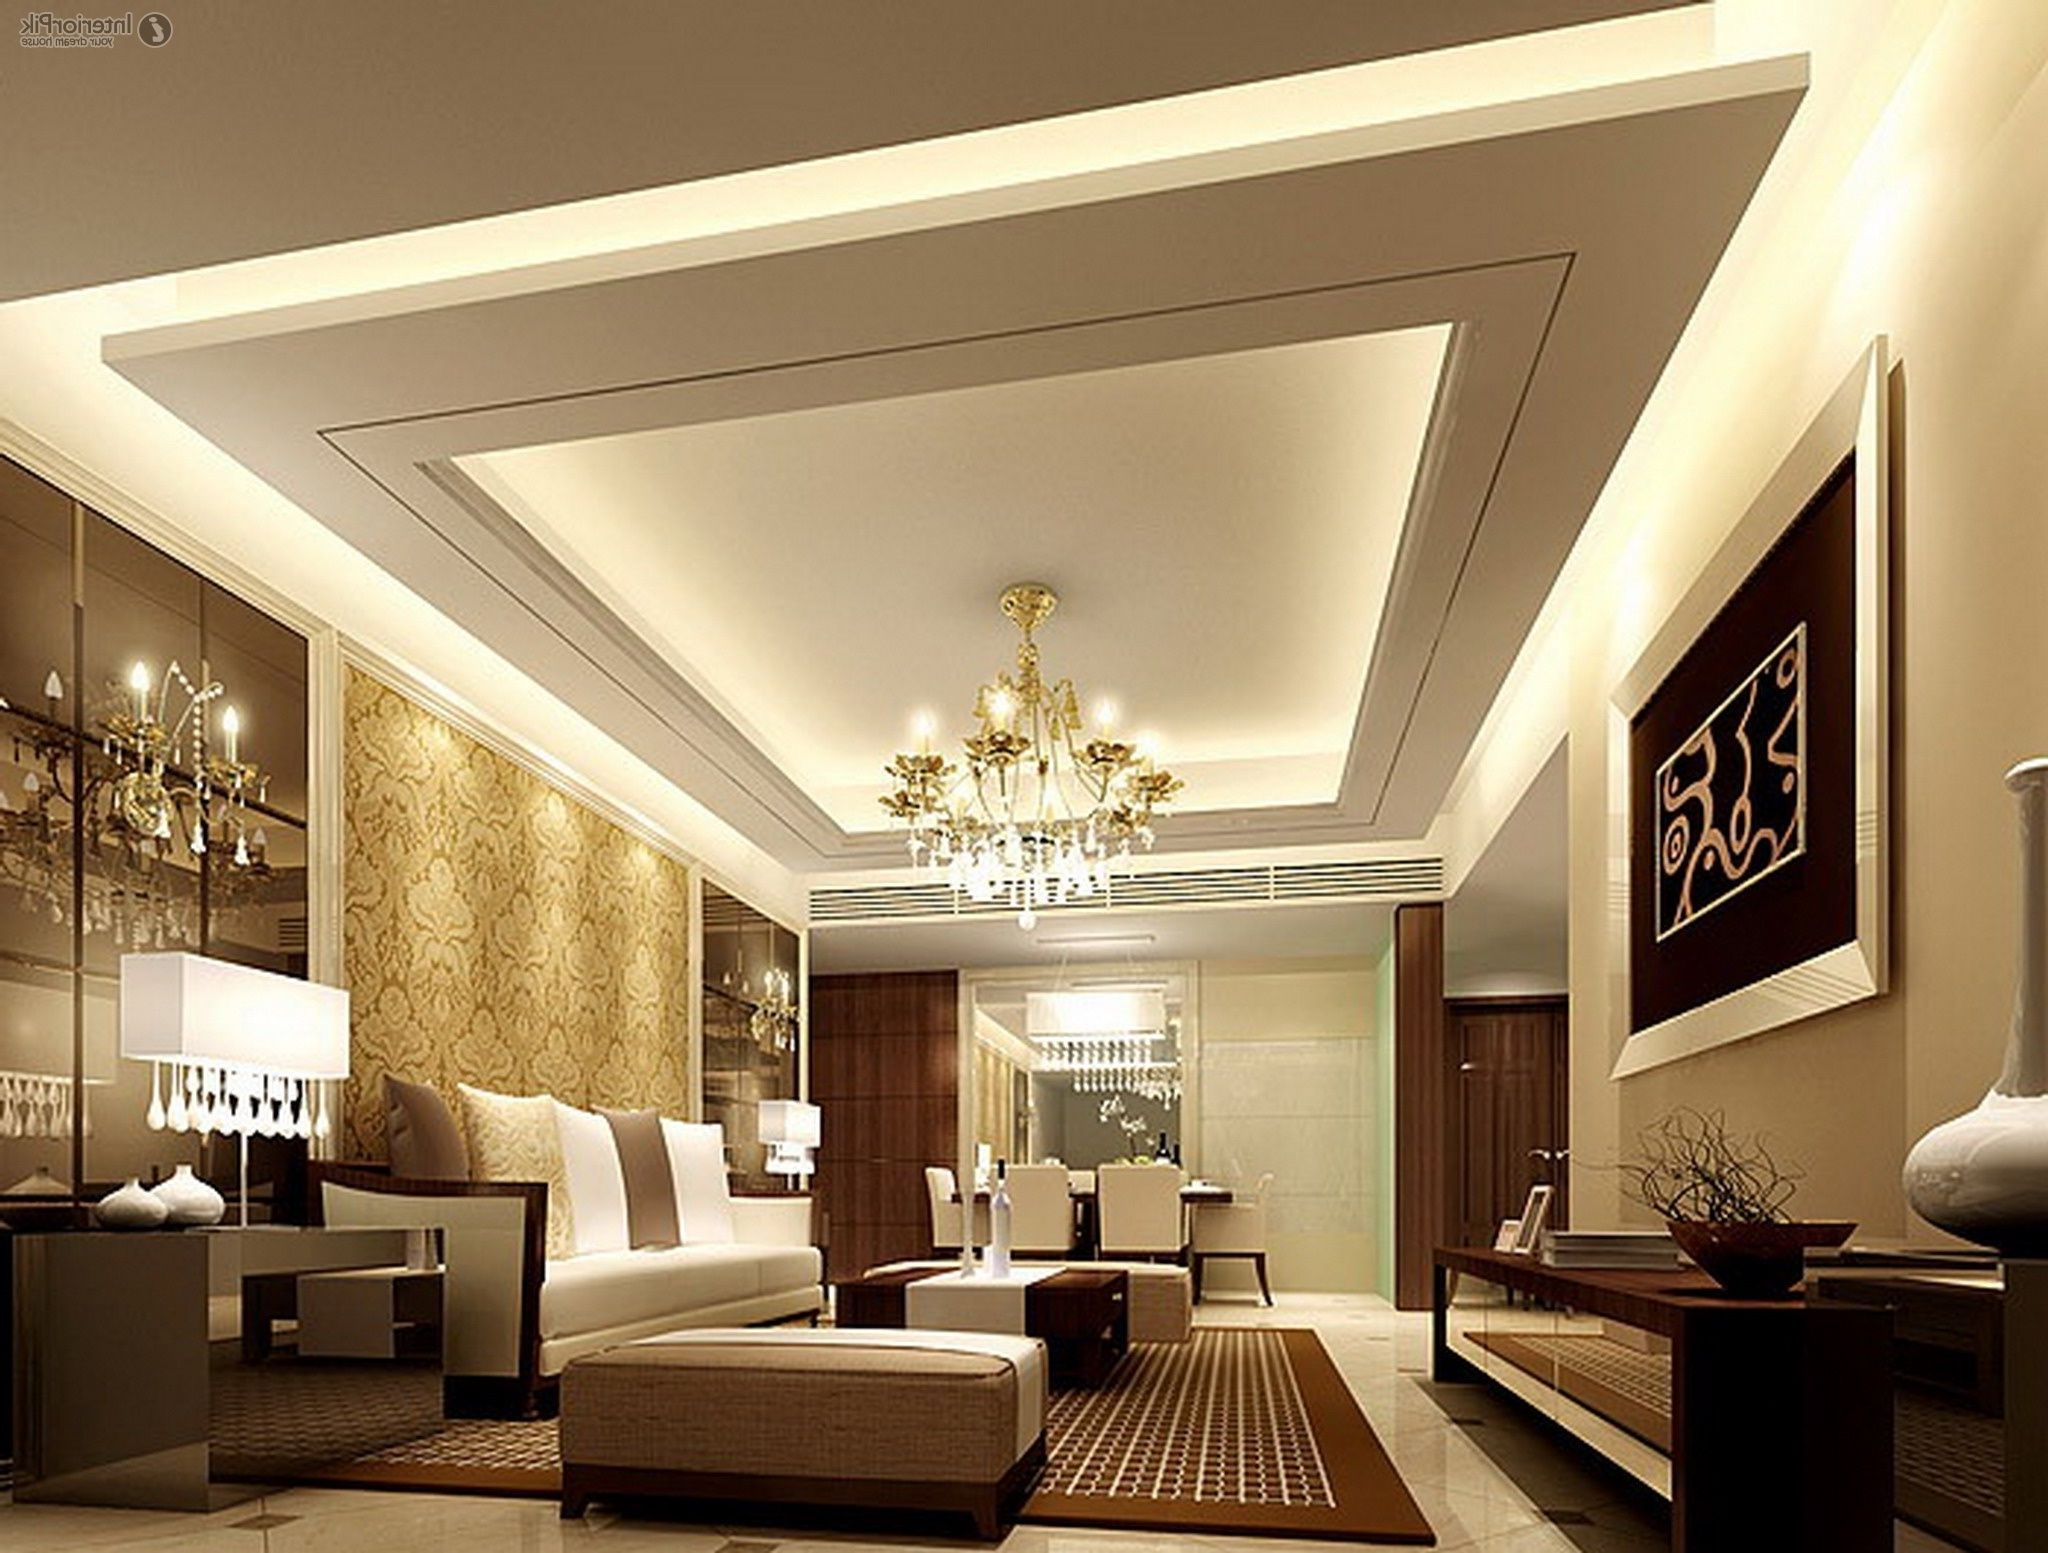 House Interior Ceiling Design Gypsum For Living Room Lighting Home